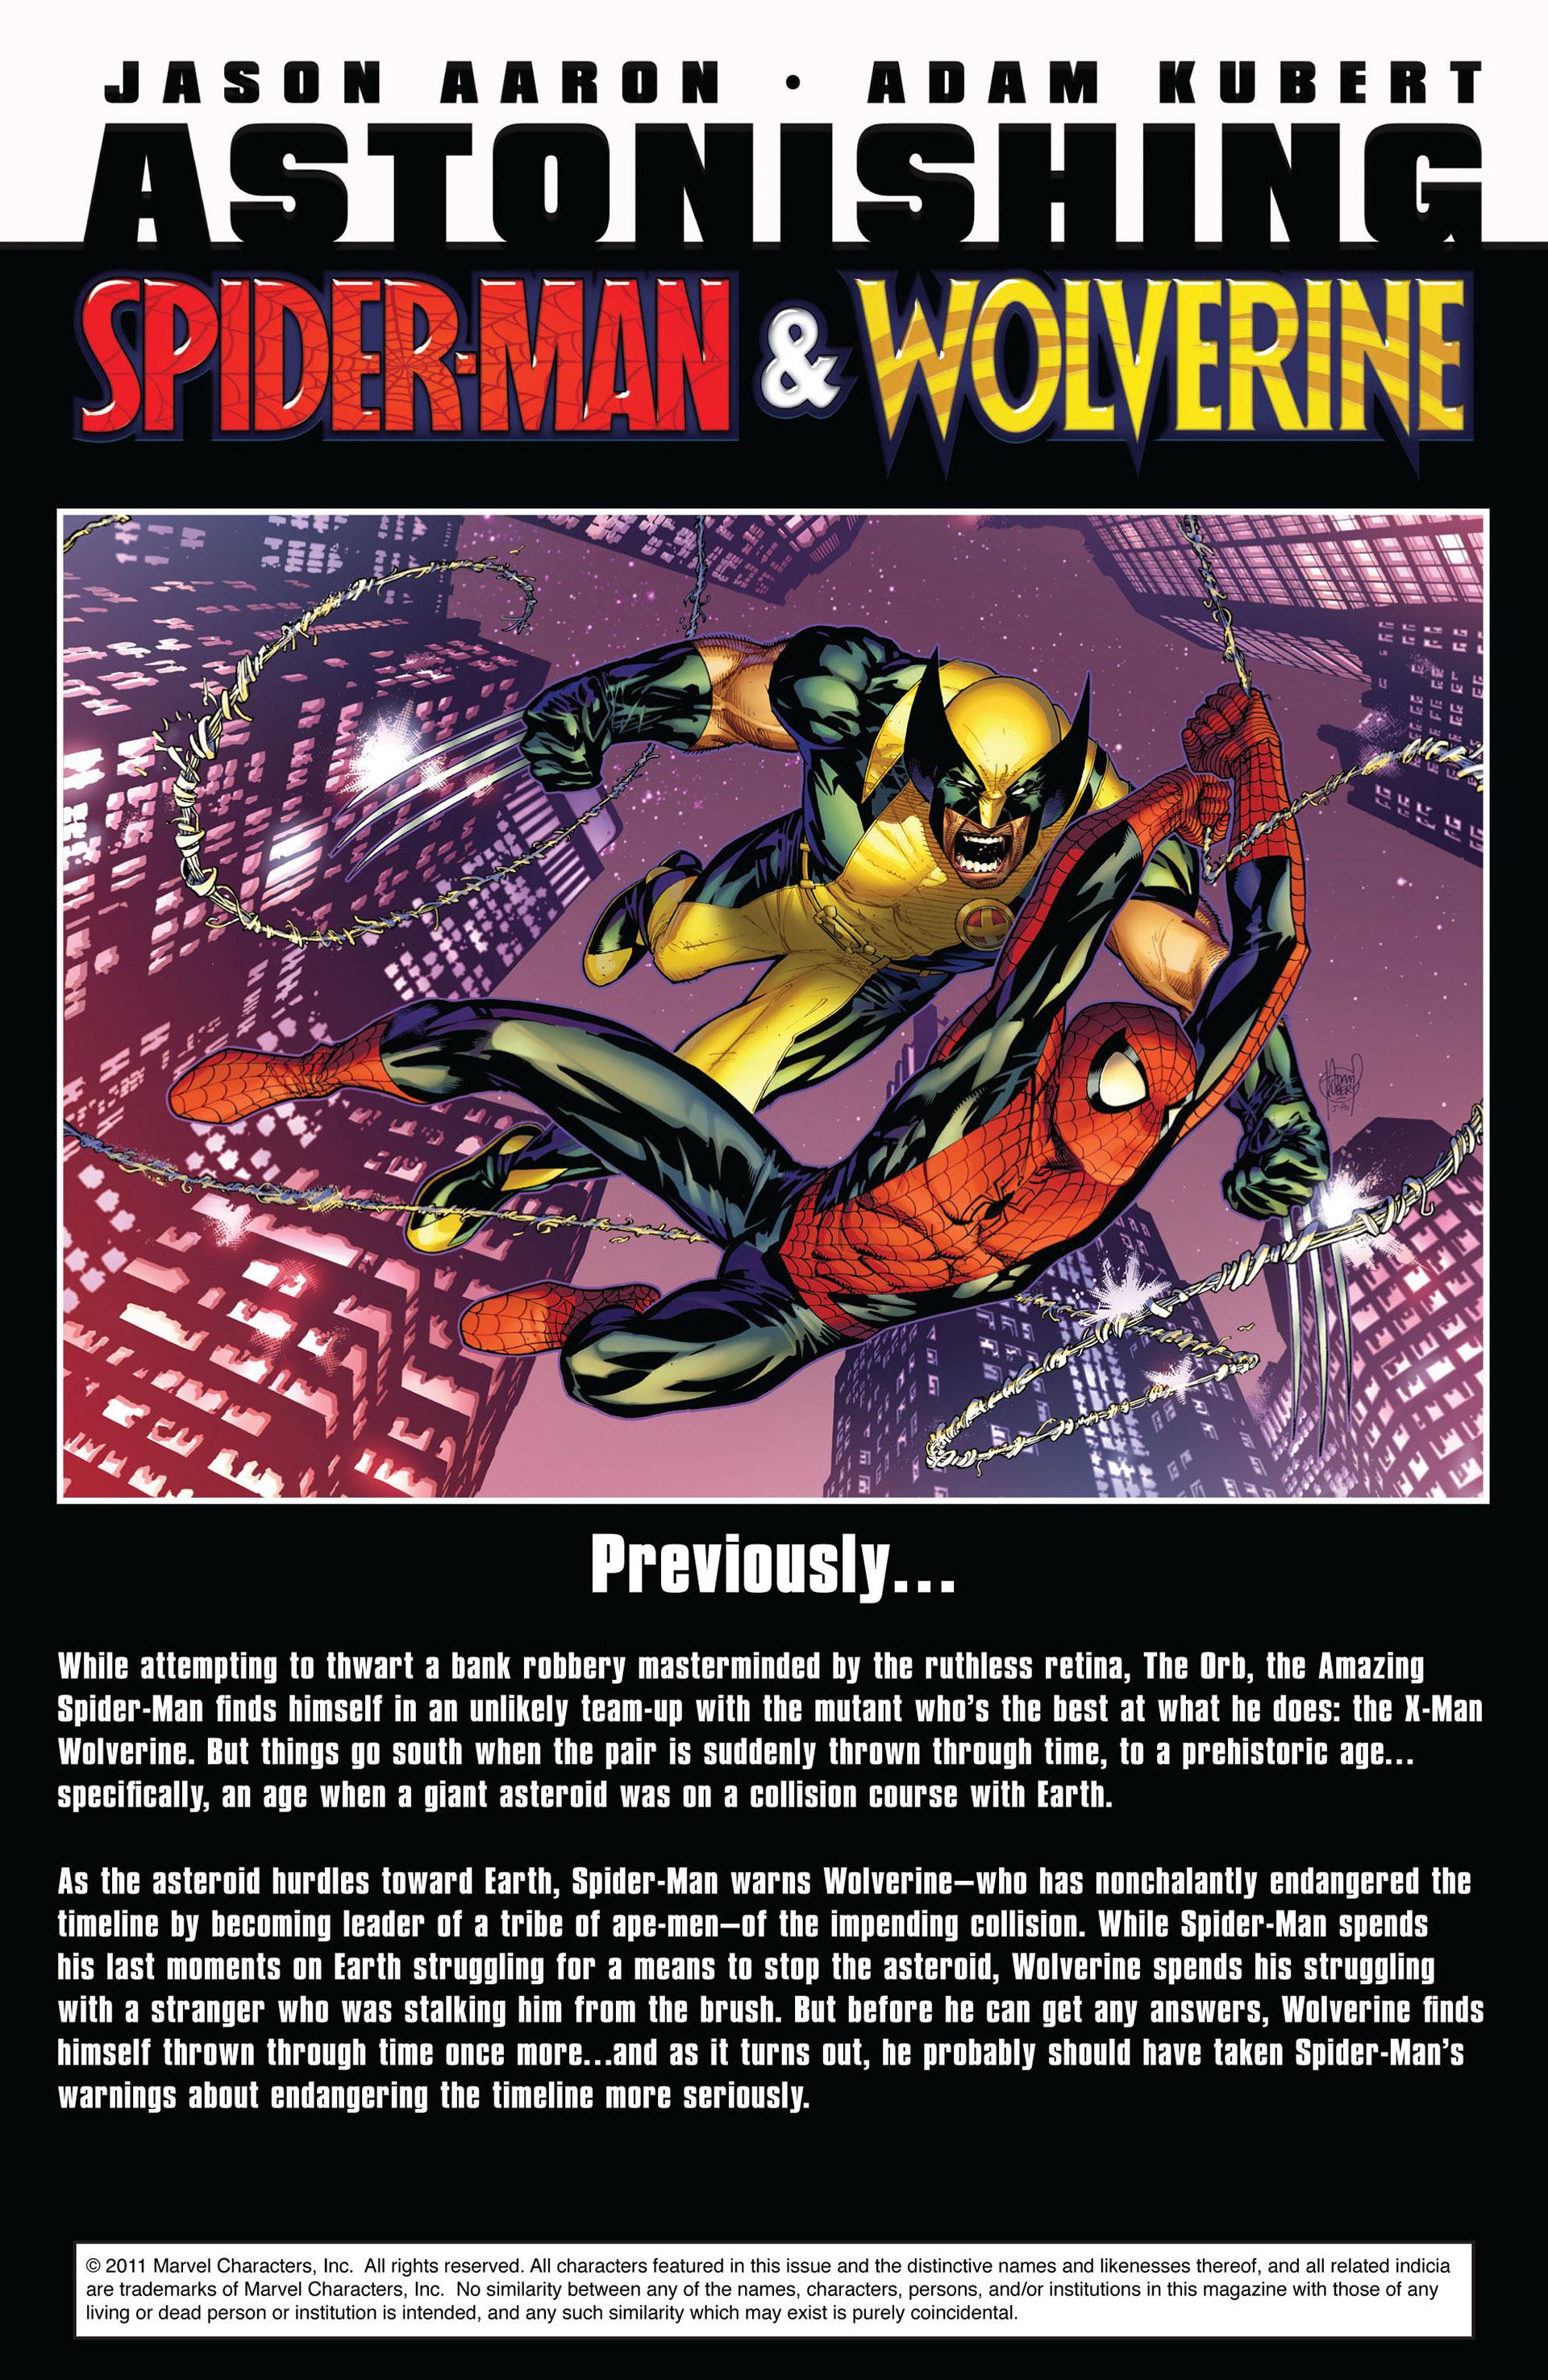 Read online Astonishing Spider-Man & Wolverine comic -  Issue #2 - 2